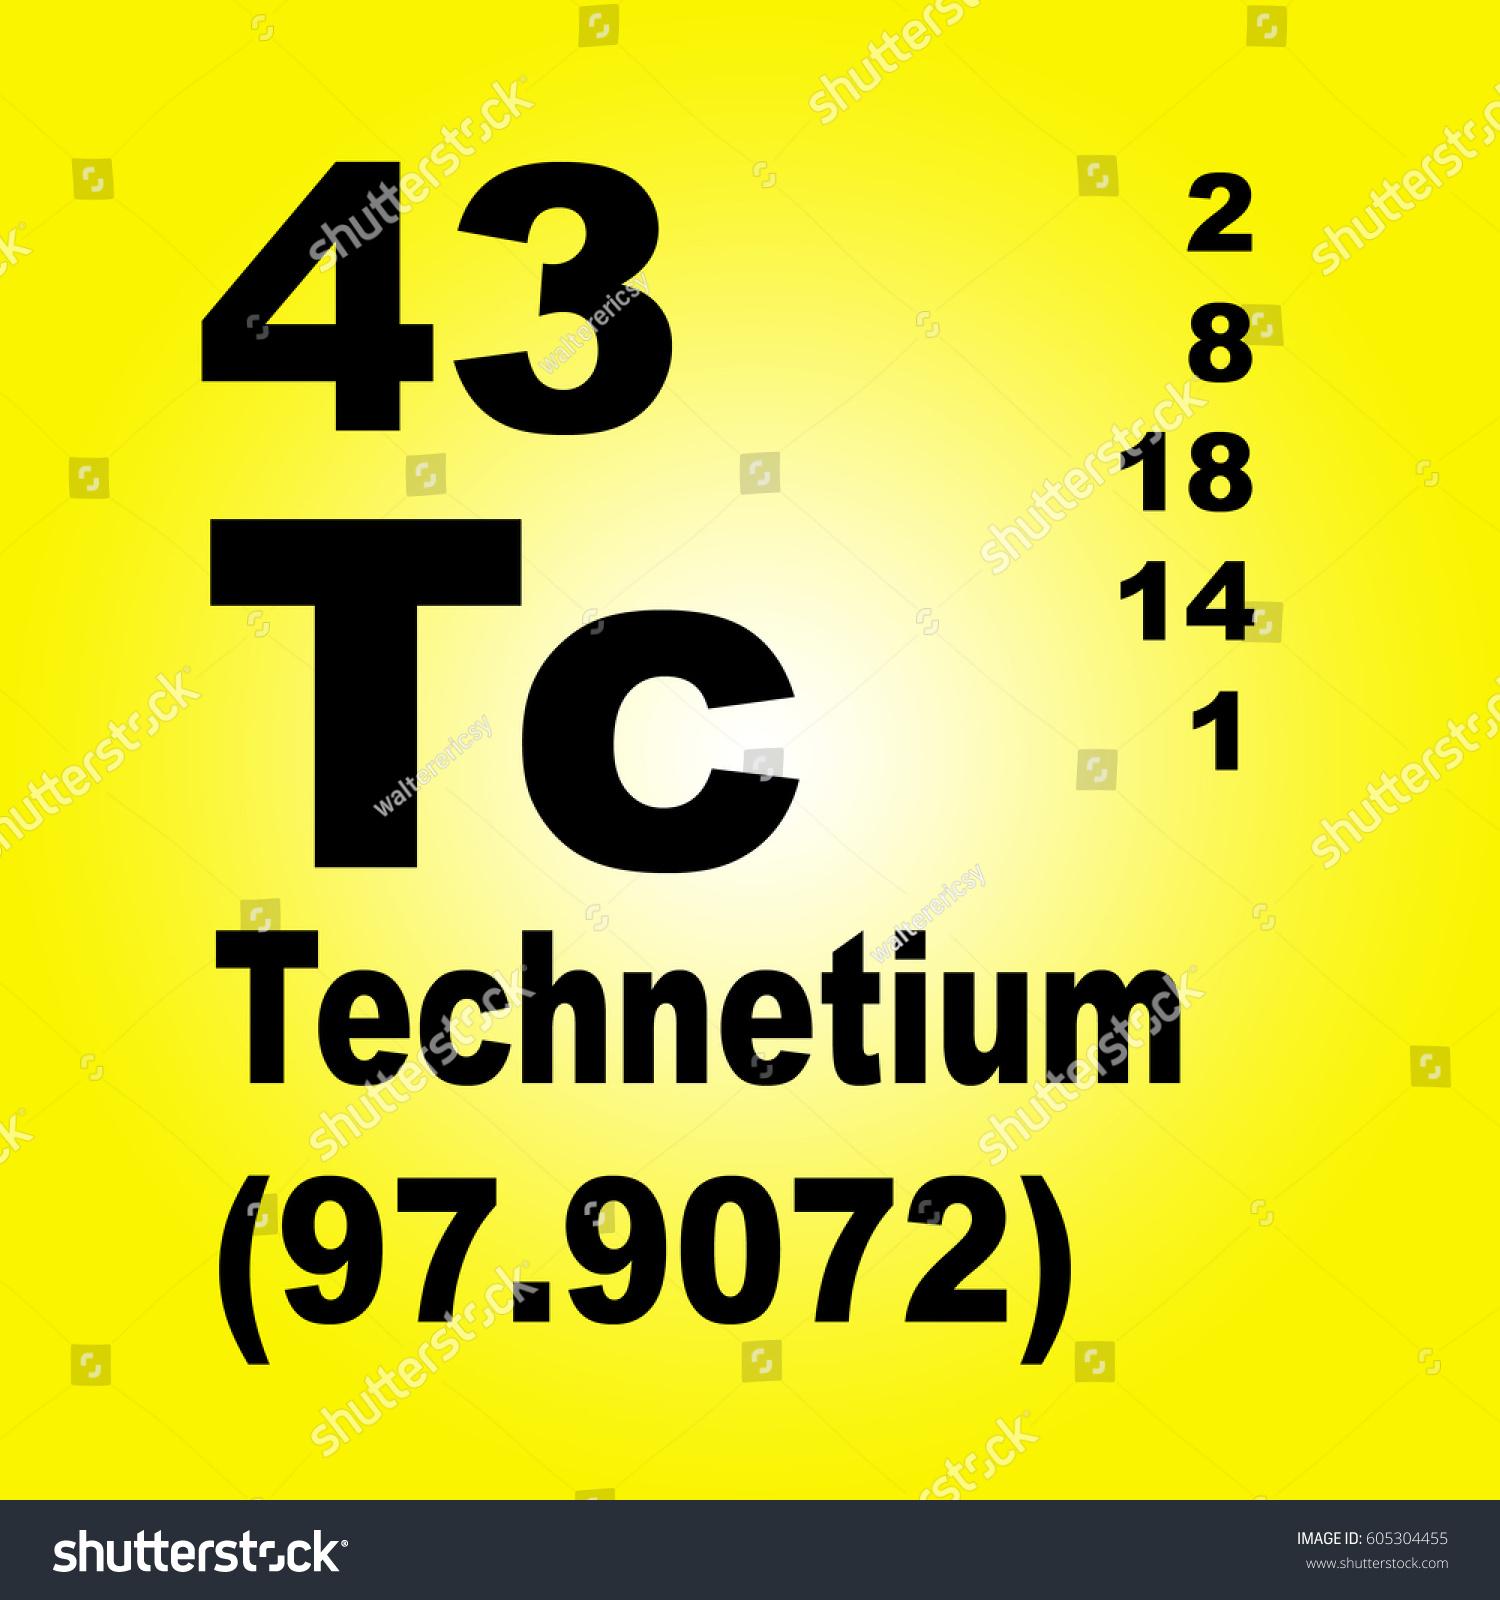 Technetium periodic table elements stock illustration 605304455 technetium periodic table of elements urtaz Images